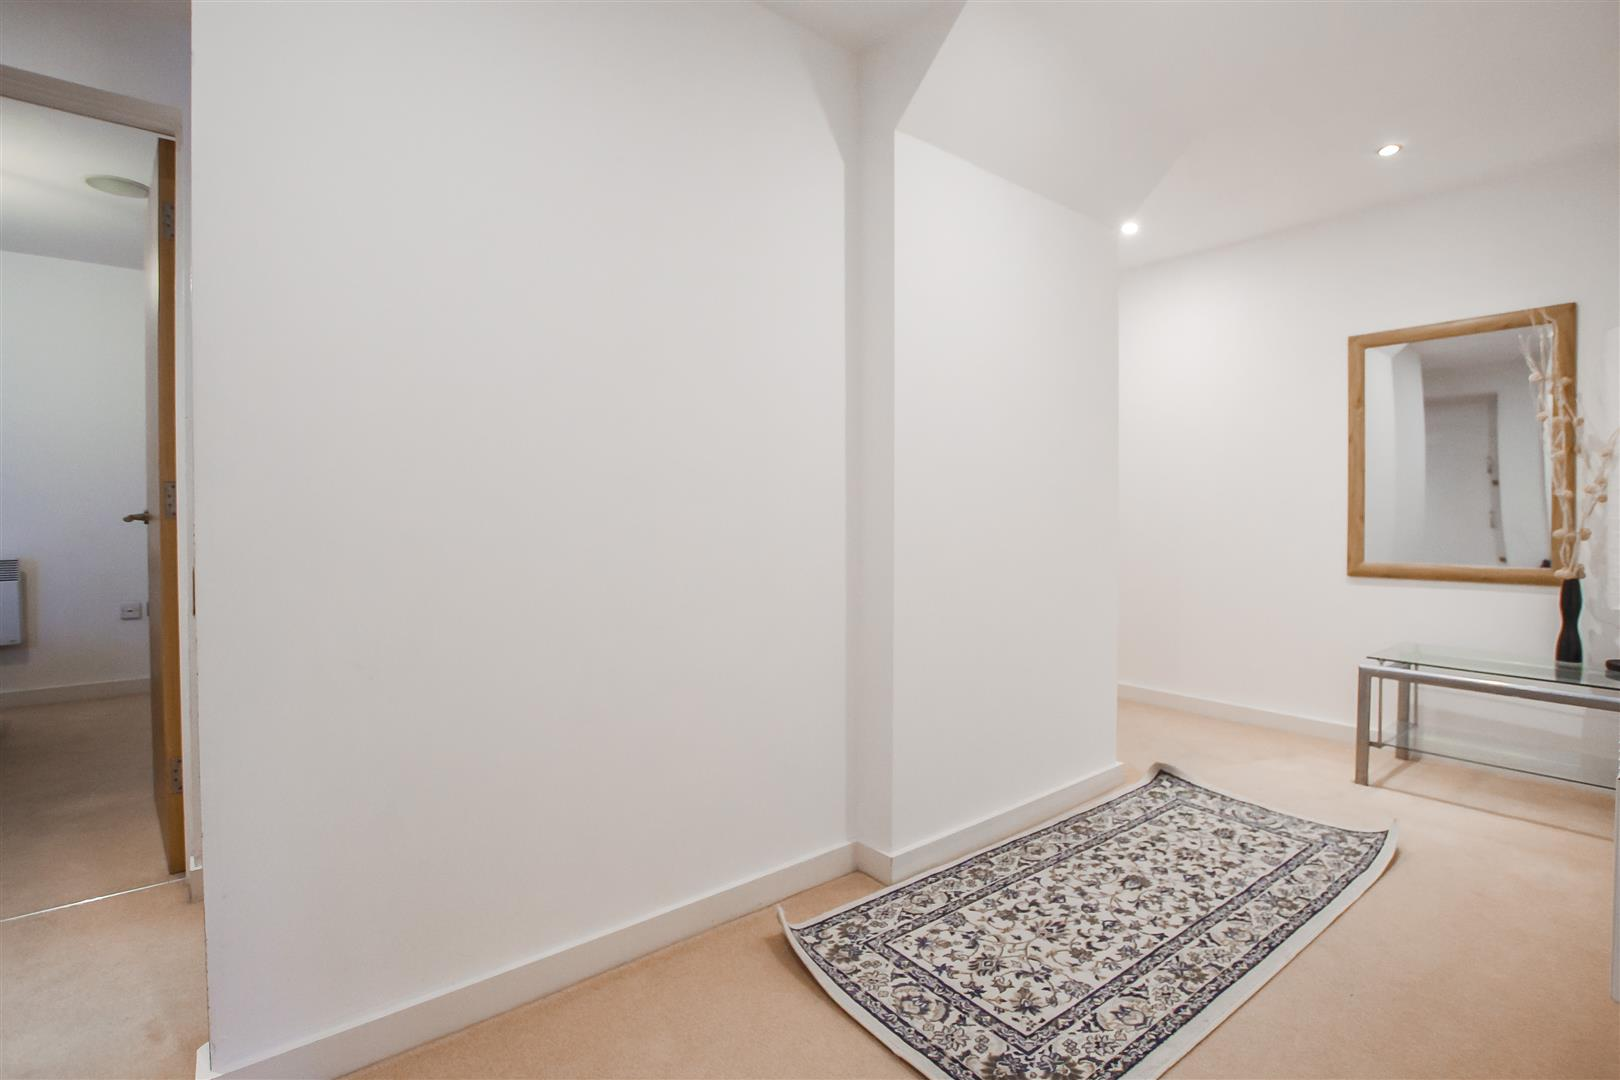 2 Bedroom Apartment For Sale - Hallway